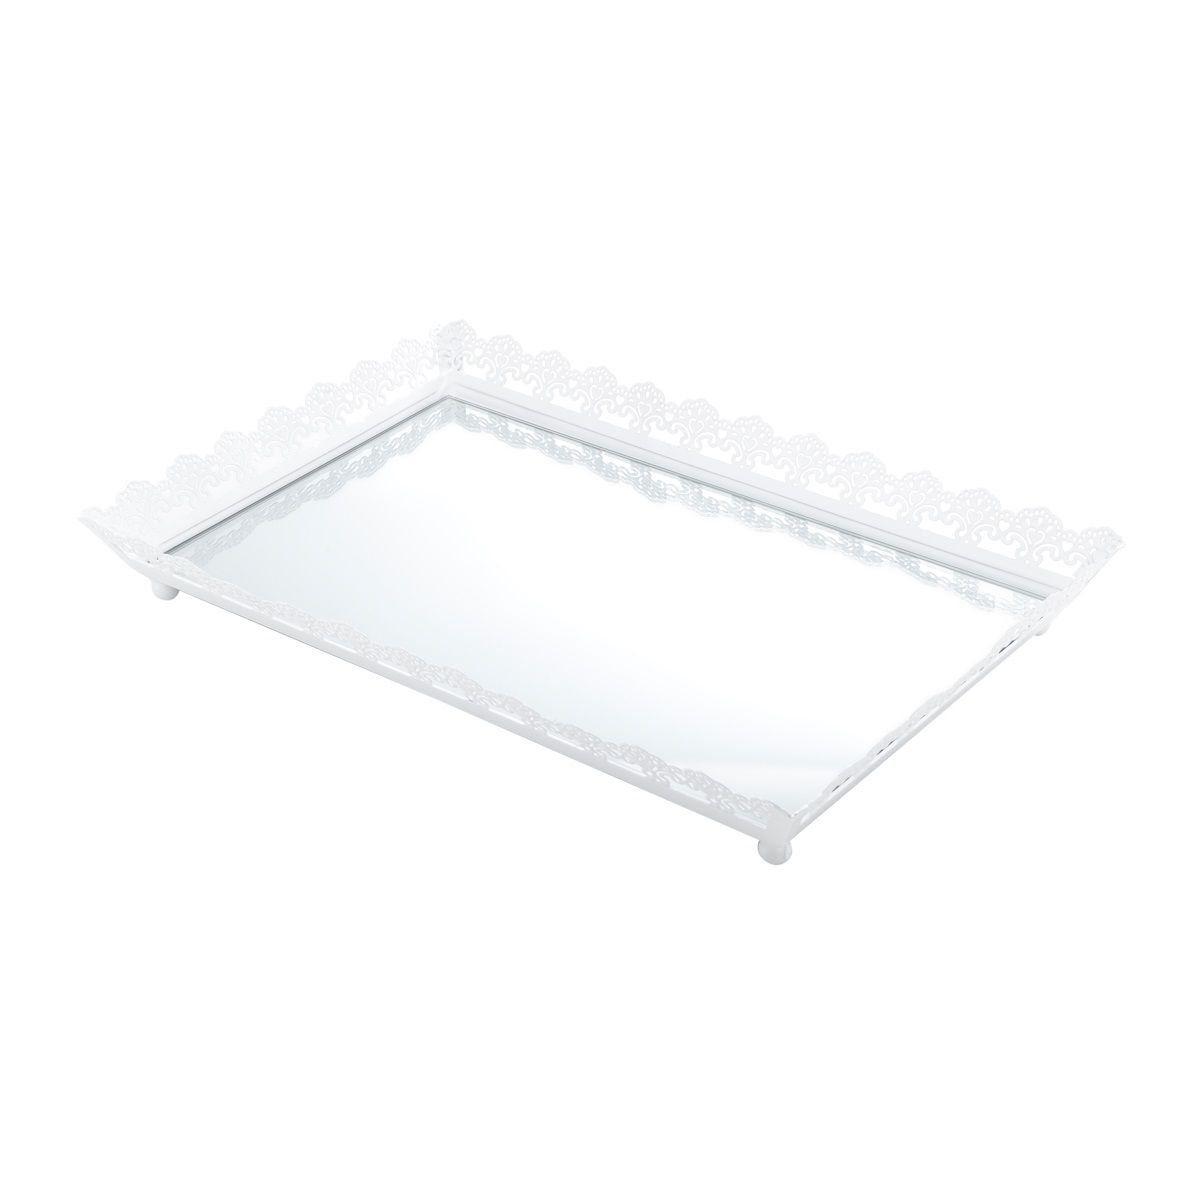 Bandeja, Suporte 43 cm de ferro esmaltado branco com espelho Bon Gourmet - 4739